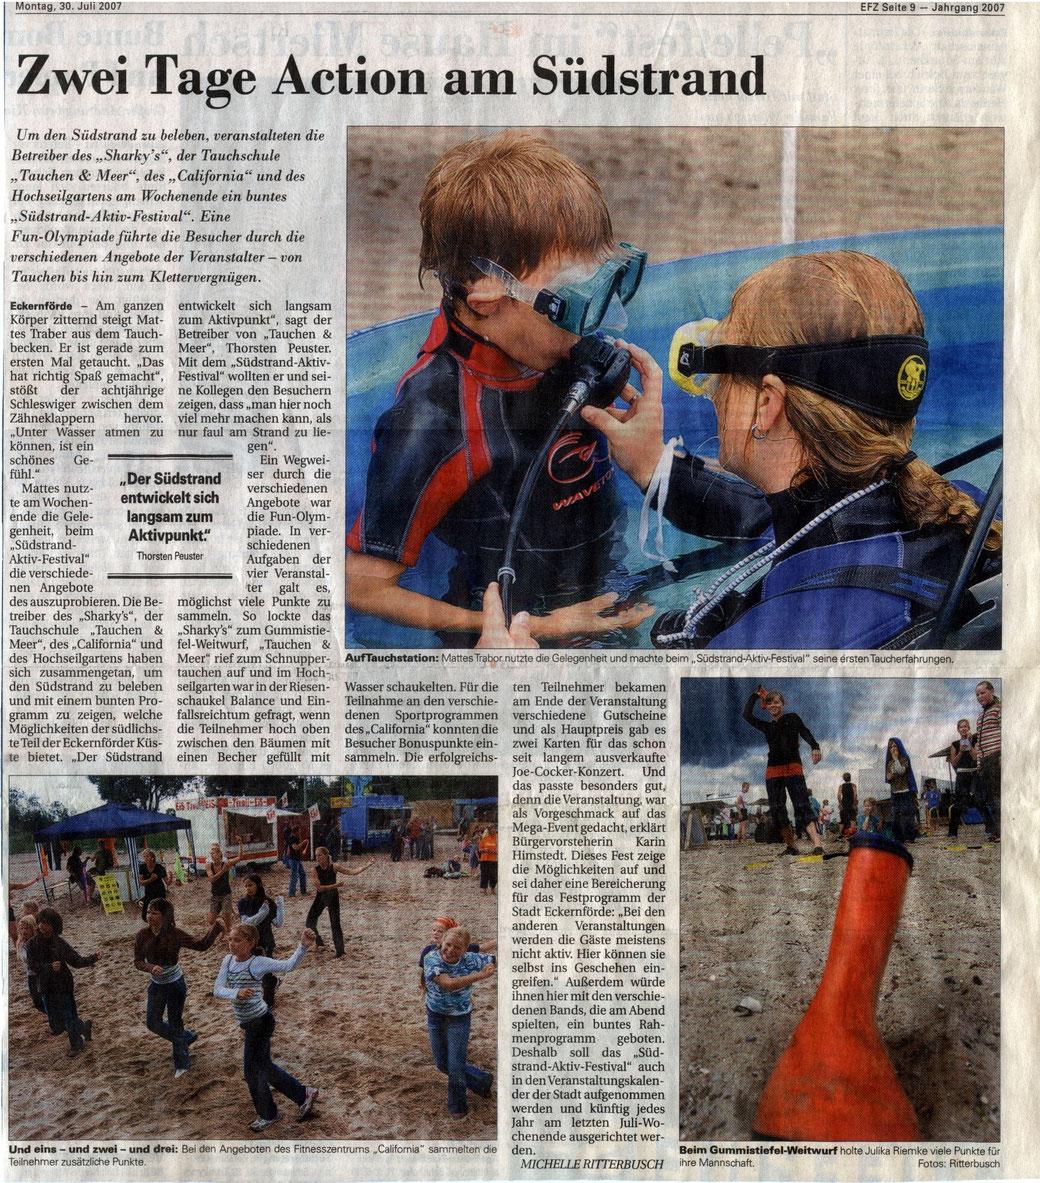 Quelle: Eckernförder Zeitung I Michelle Ritterbusch I 30.07.2007